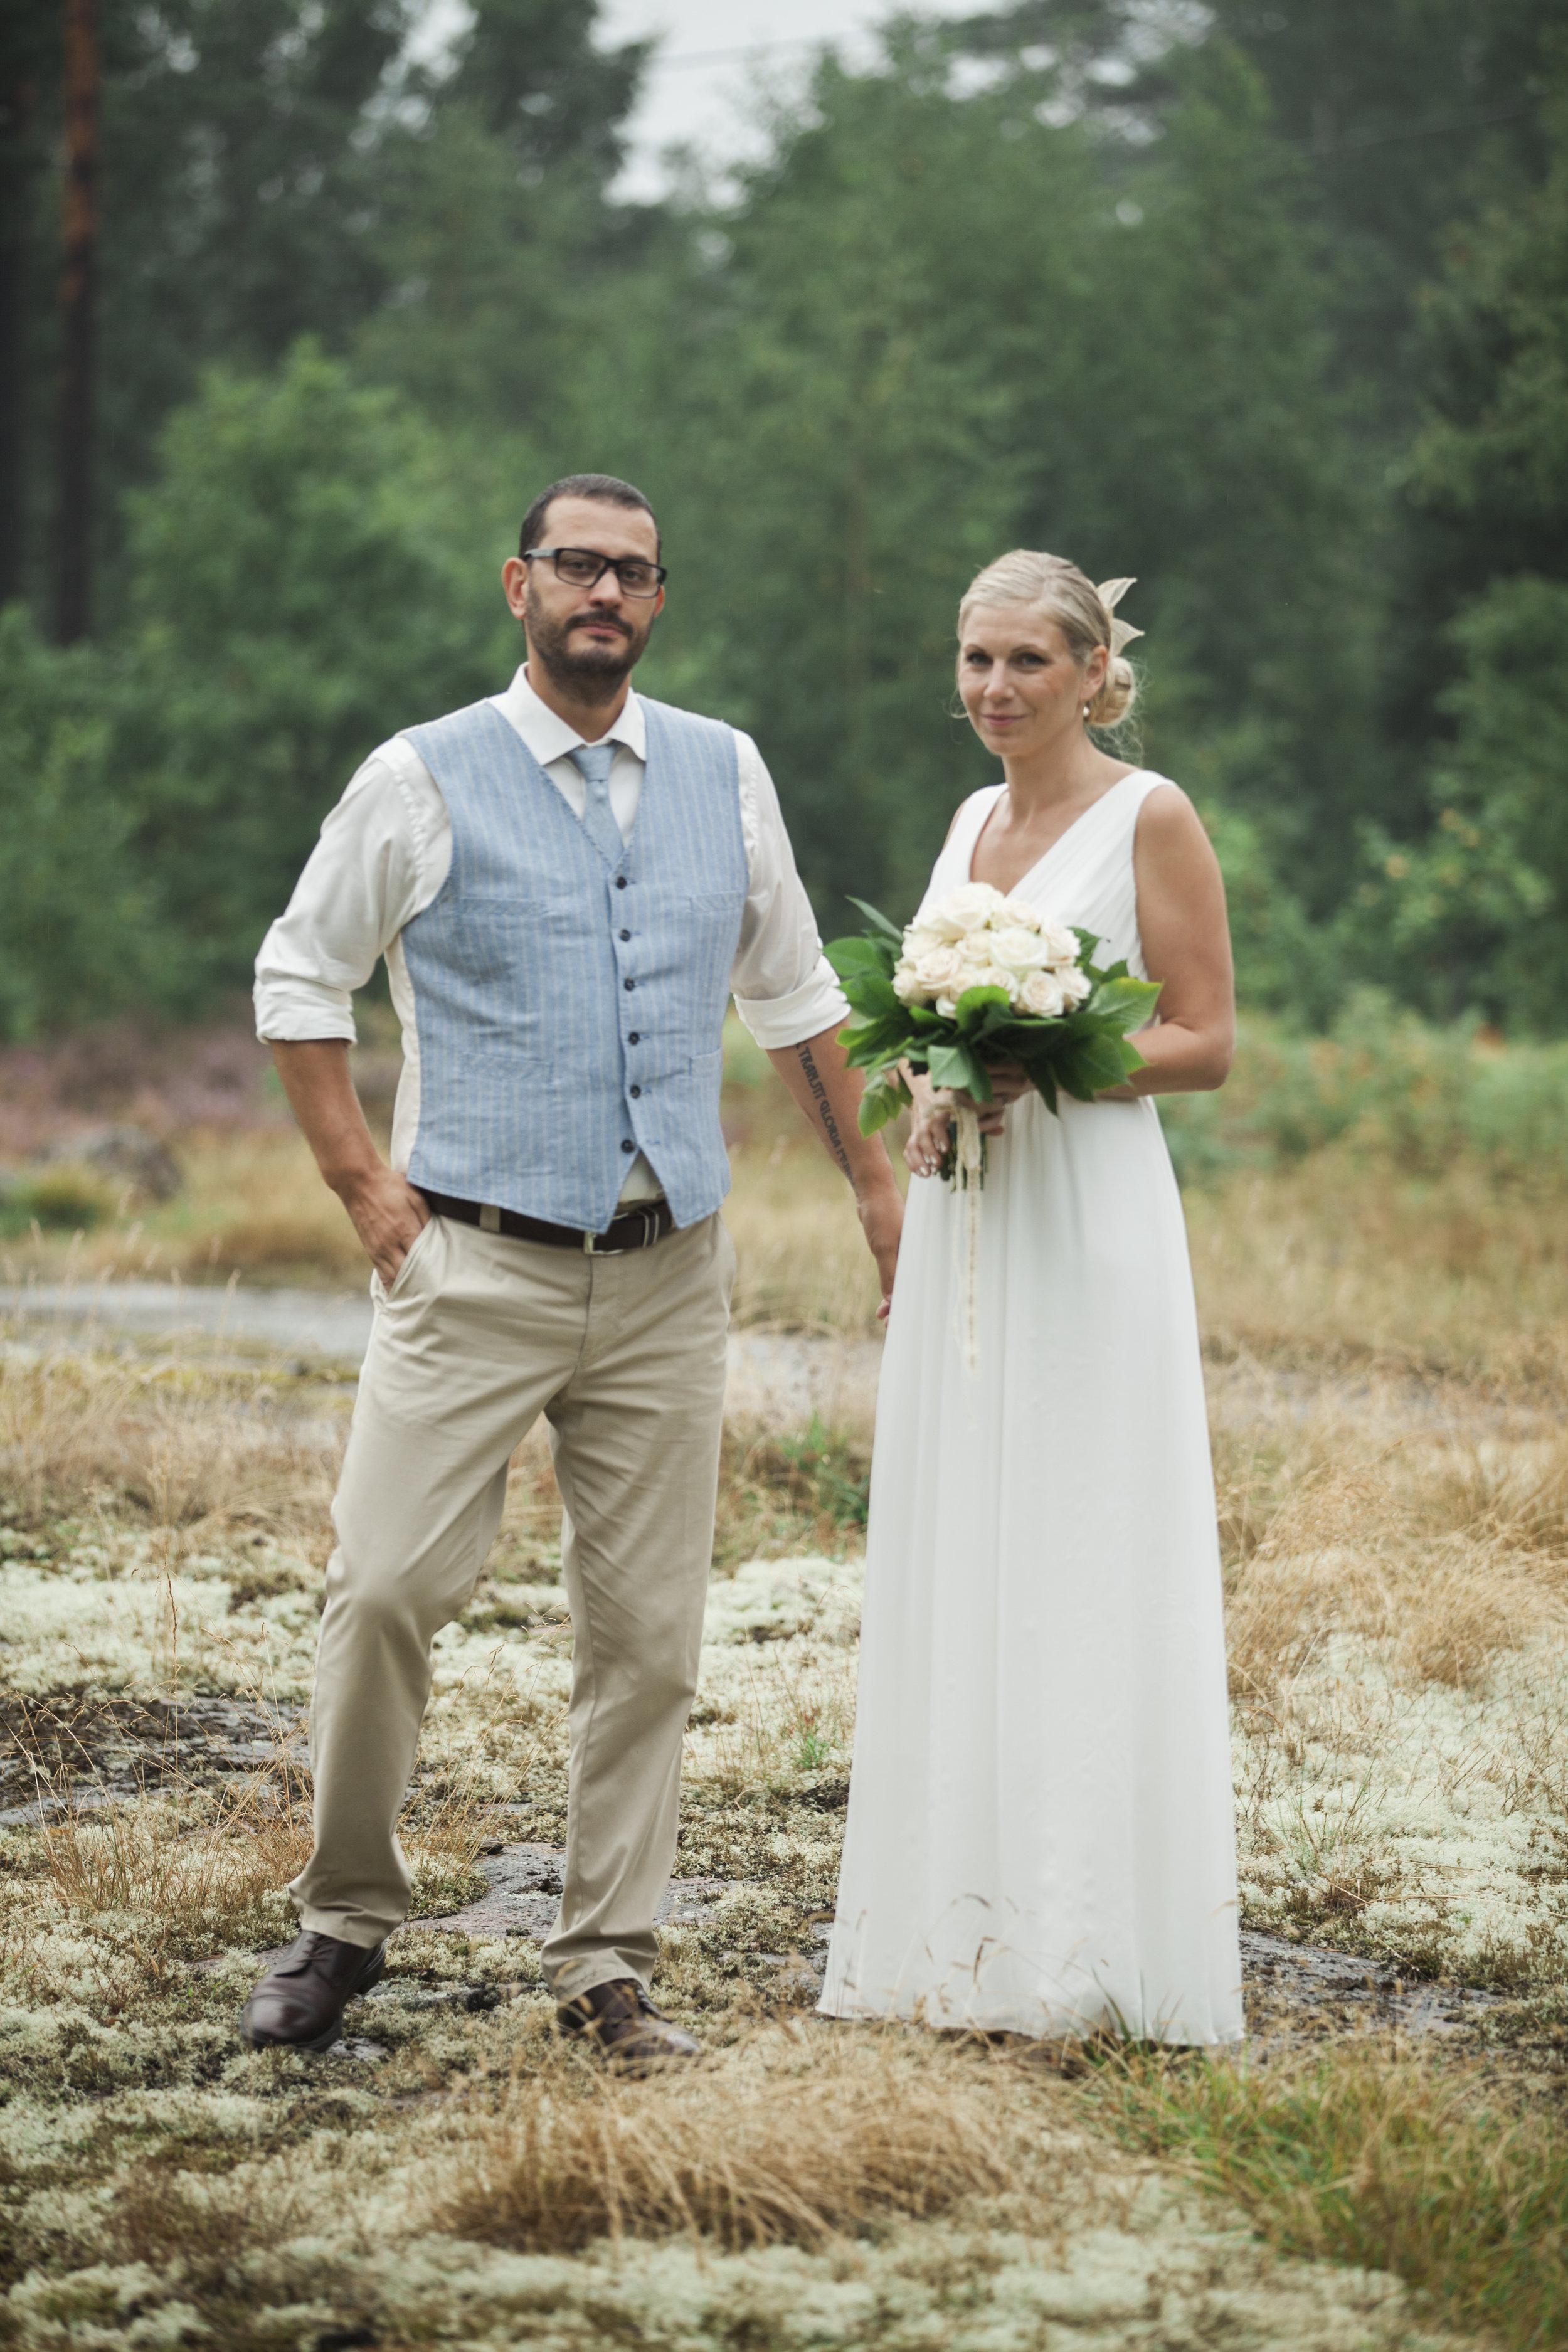 Bröllop-126.jpg